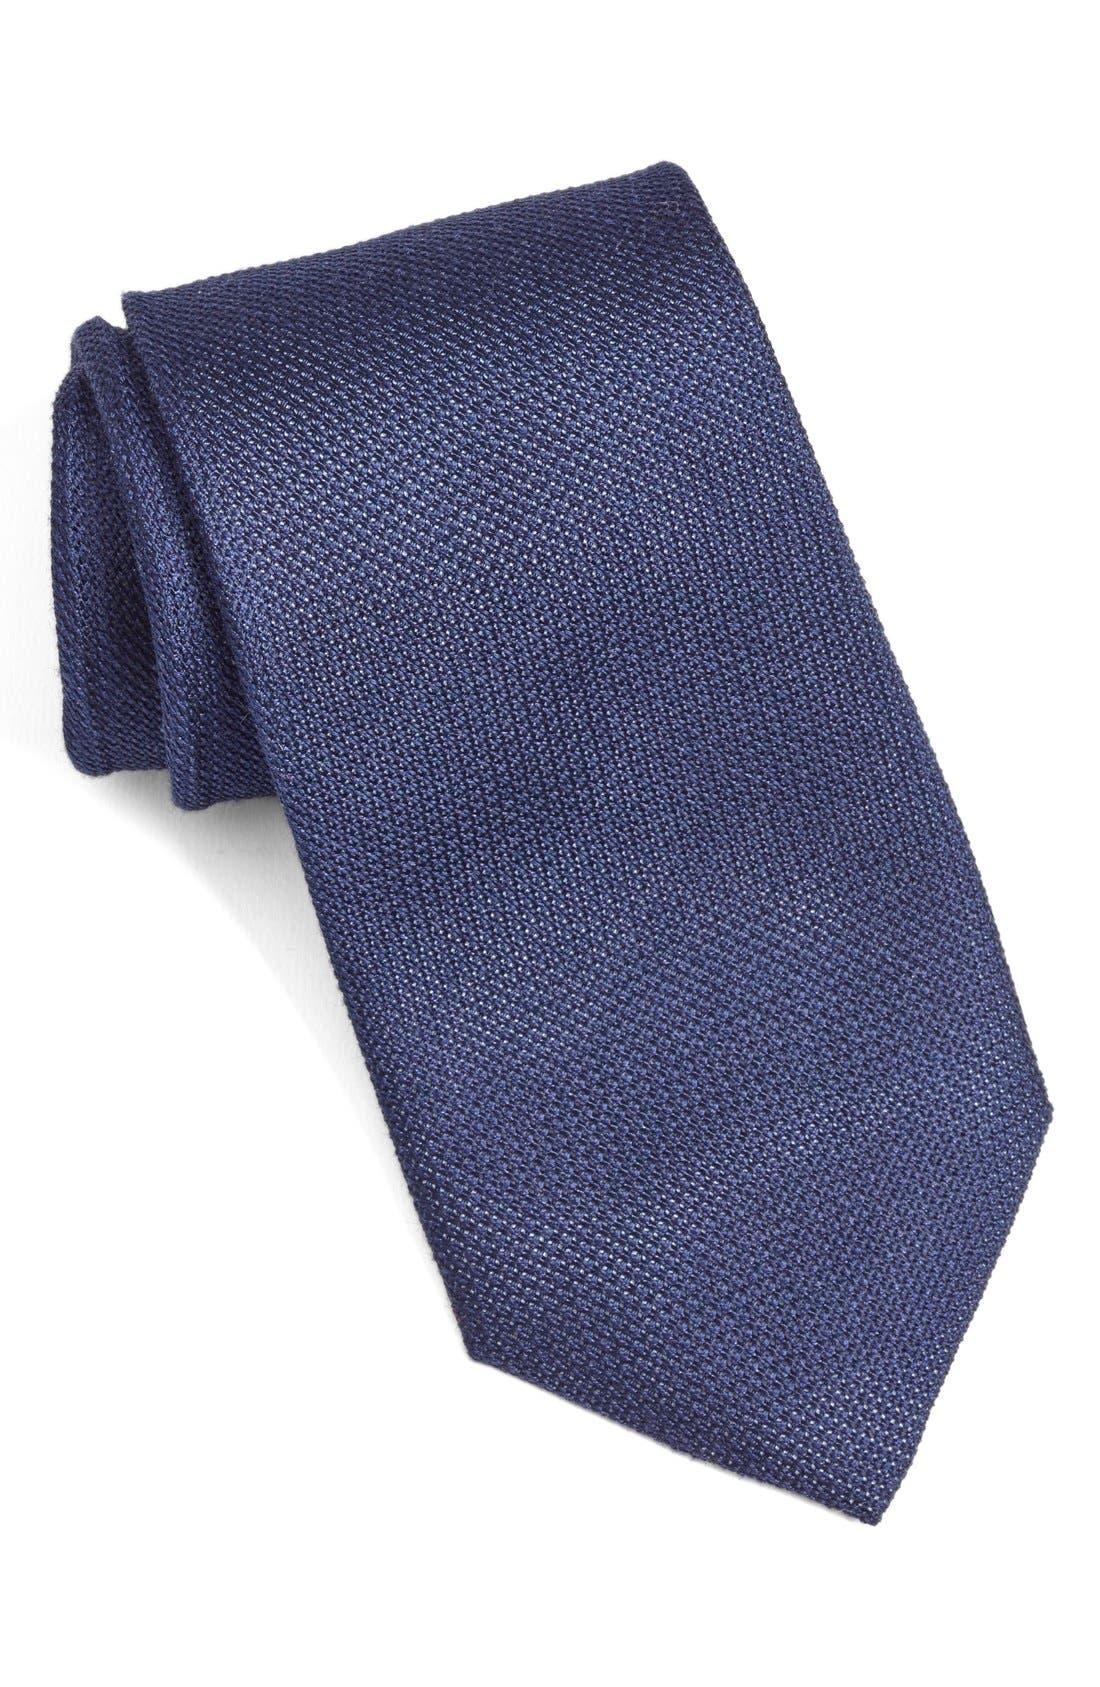 Nordstrom Men's Shop 'Grenadine Solid' Silk Tie